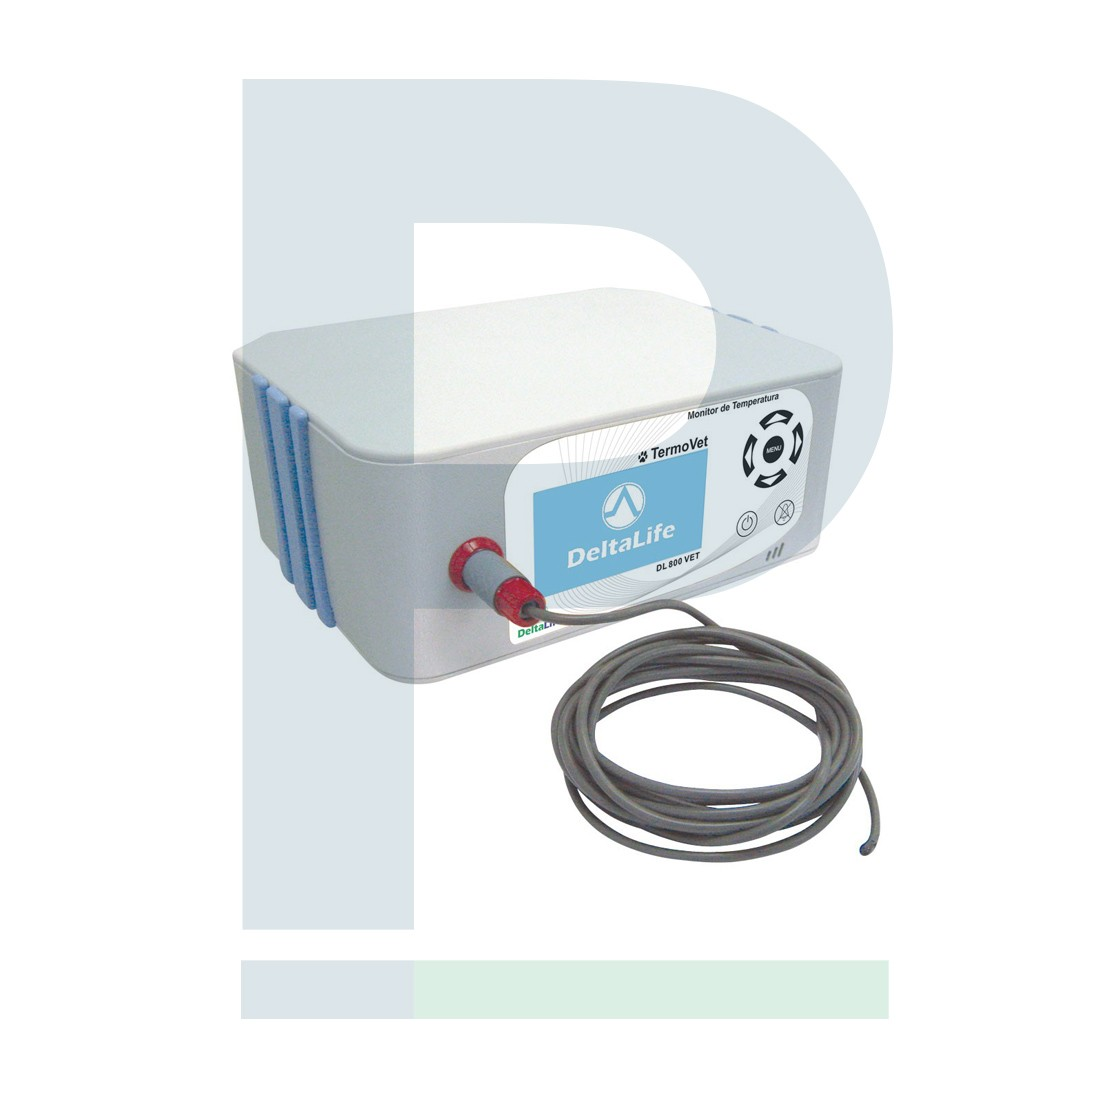 G- Termo Vet DL800 (monitor de temperatura)